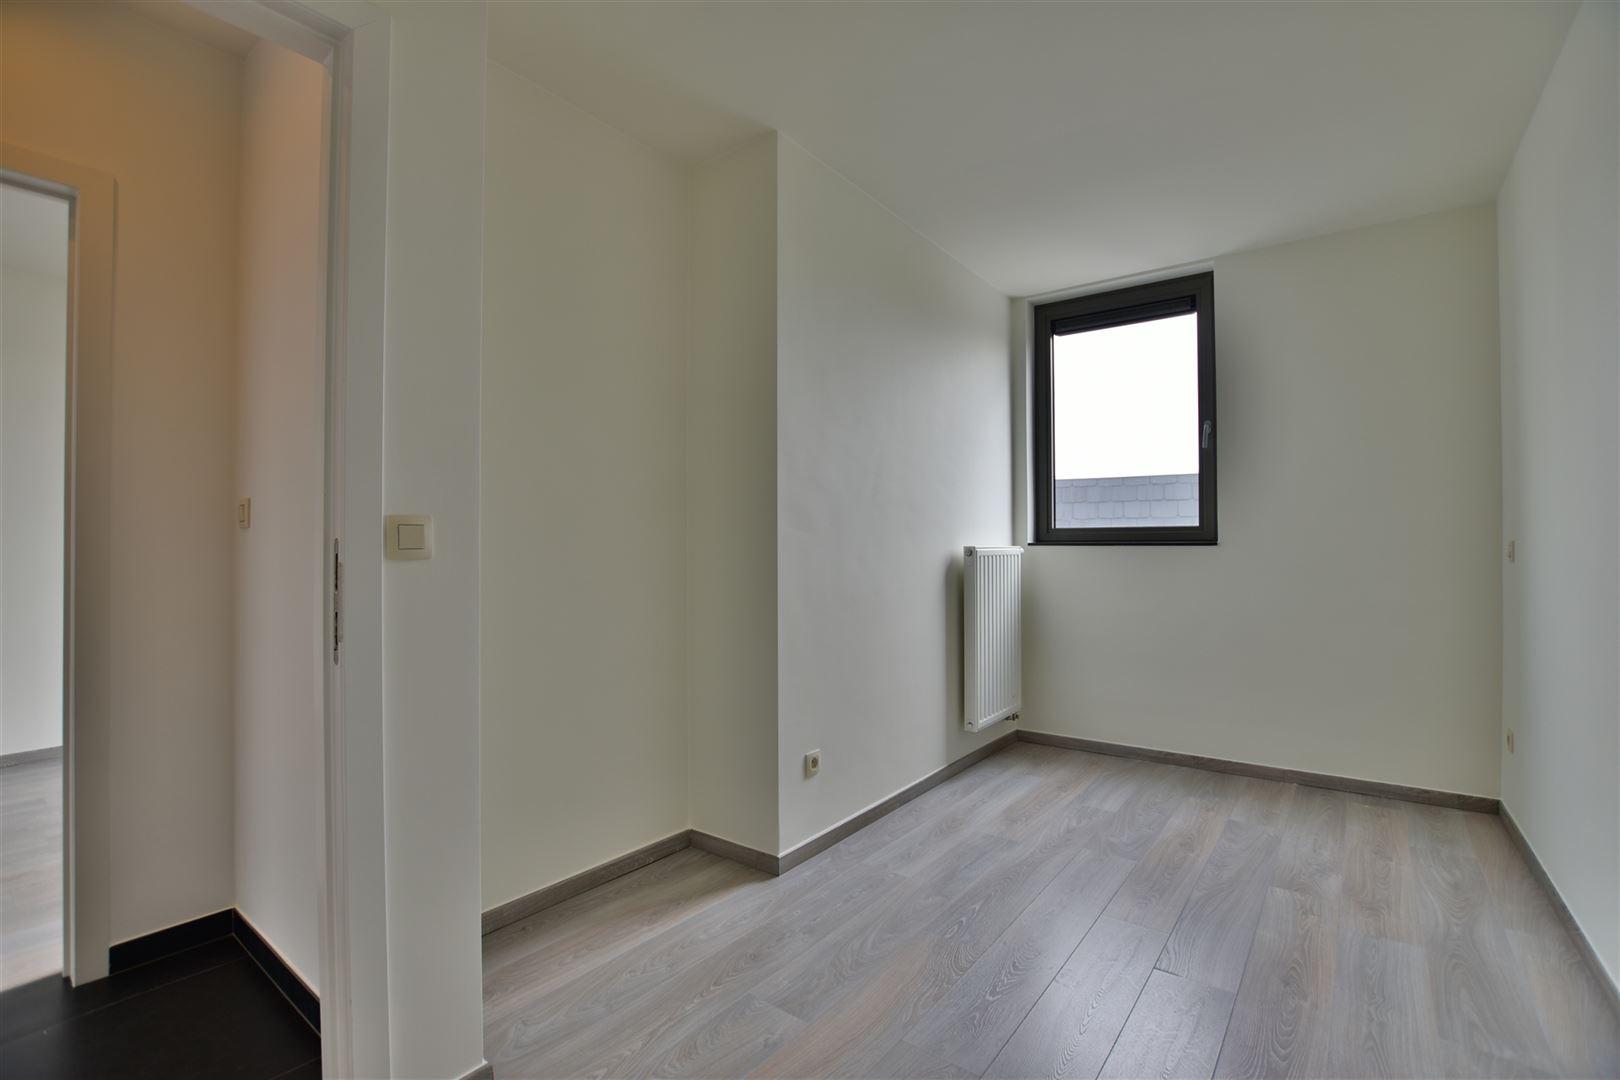 Foto 25 : Duplex/Penthouse te 9200 Sint-Gillis-bij-Dendermonde (België) - Prijs € 278.000